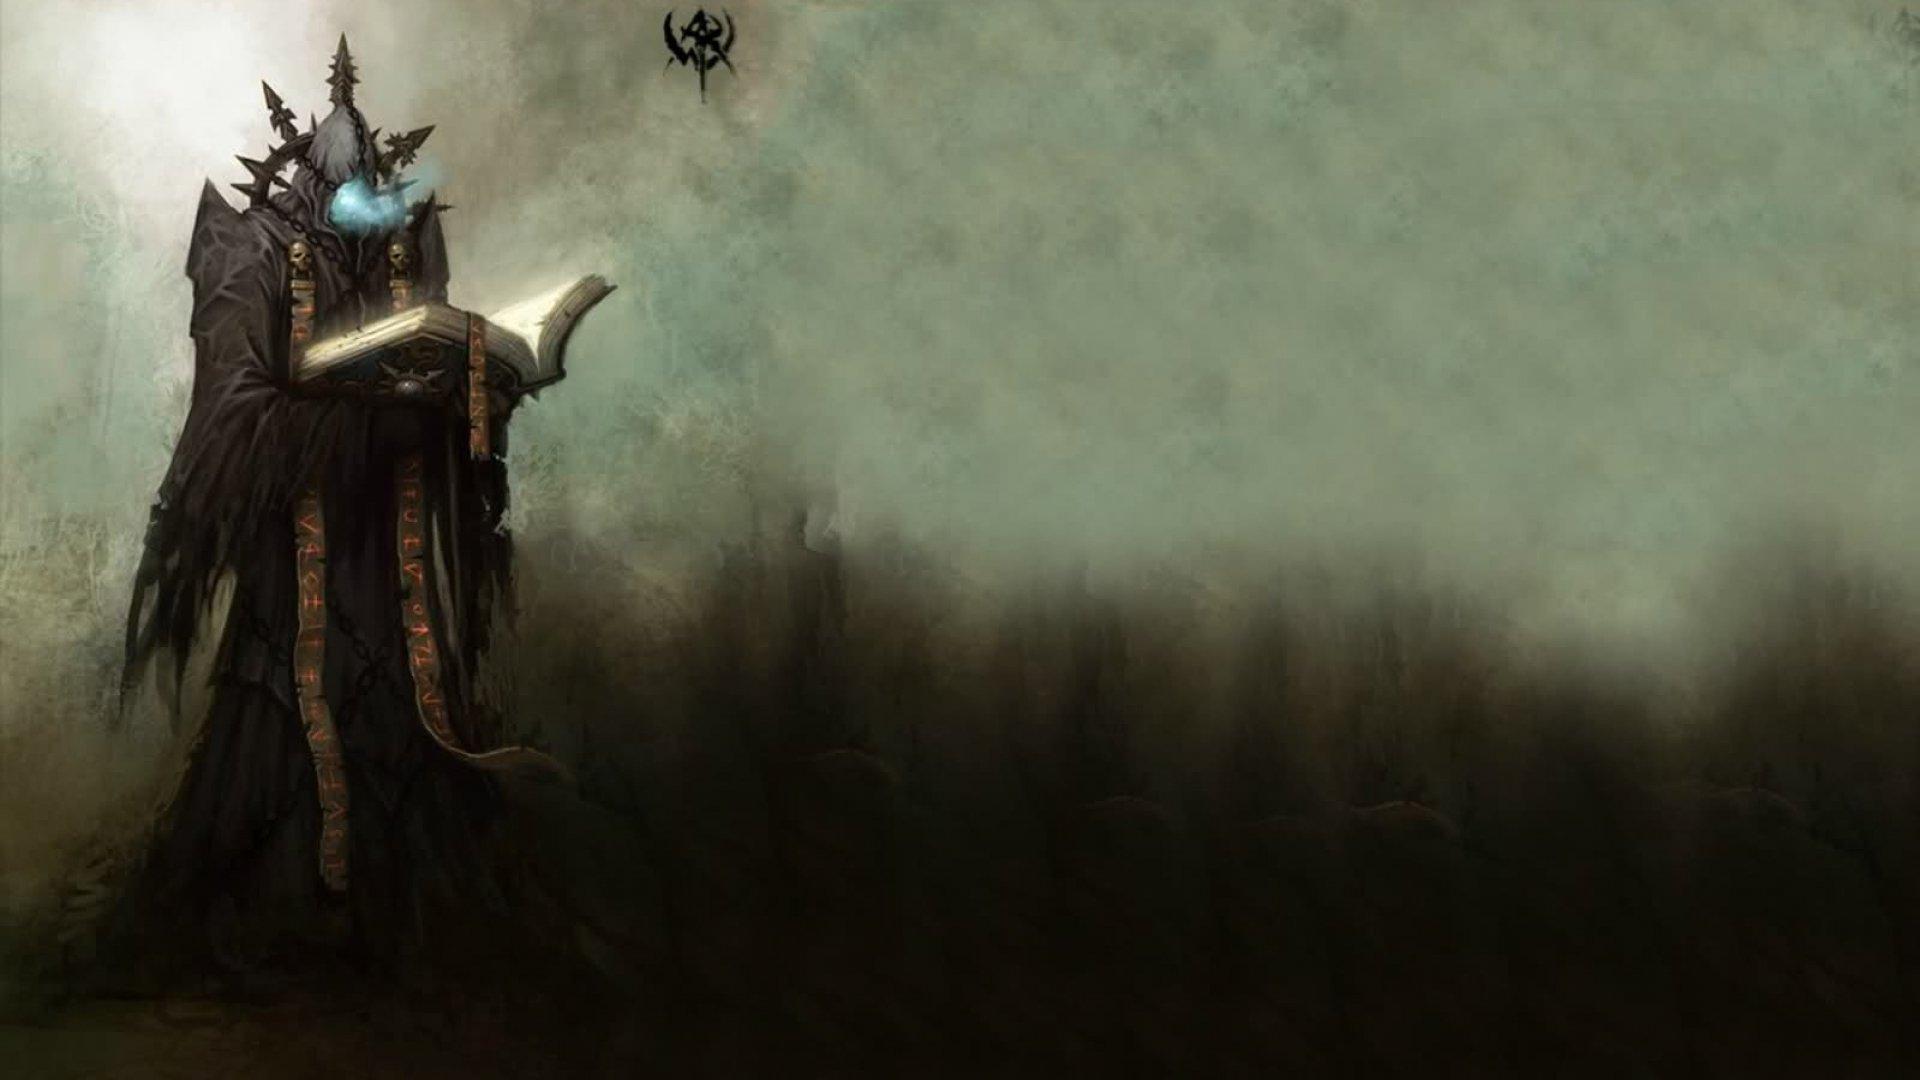 Dark Images Wallpaper Hd Fantasy Mage Wizard Sorcerer Art Artwork Magic Magician